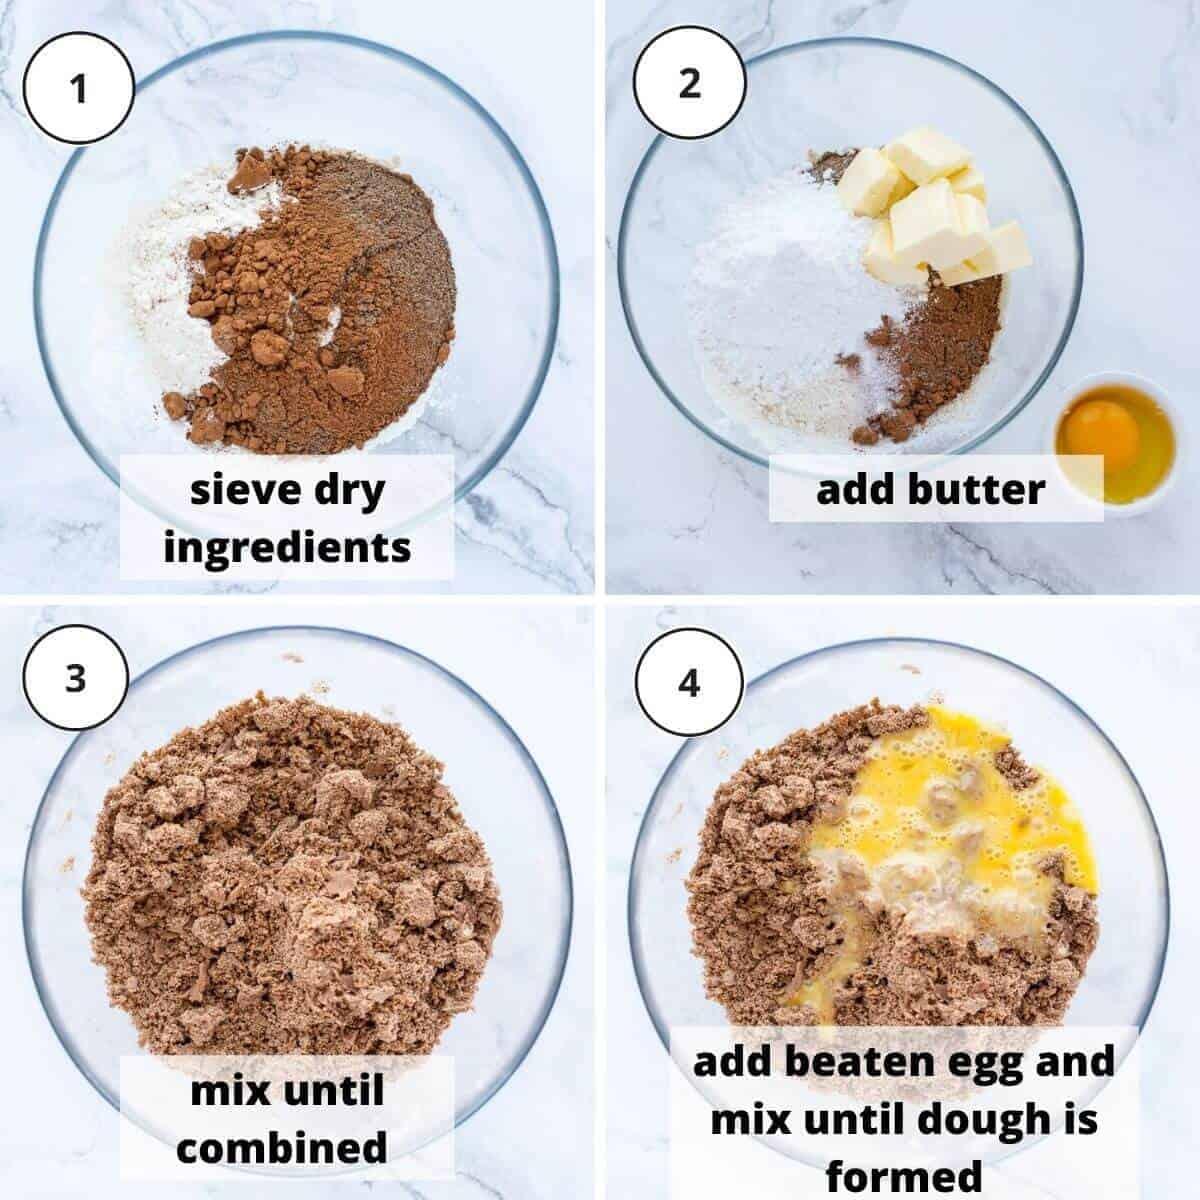 steps to make tart pastry.